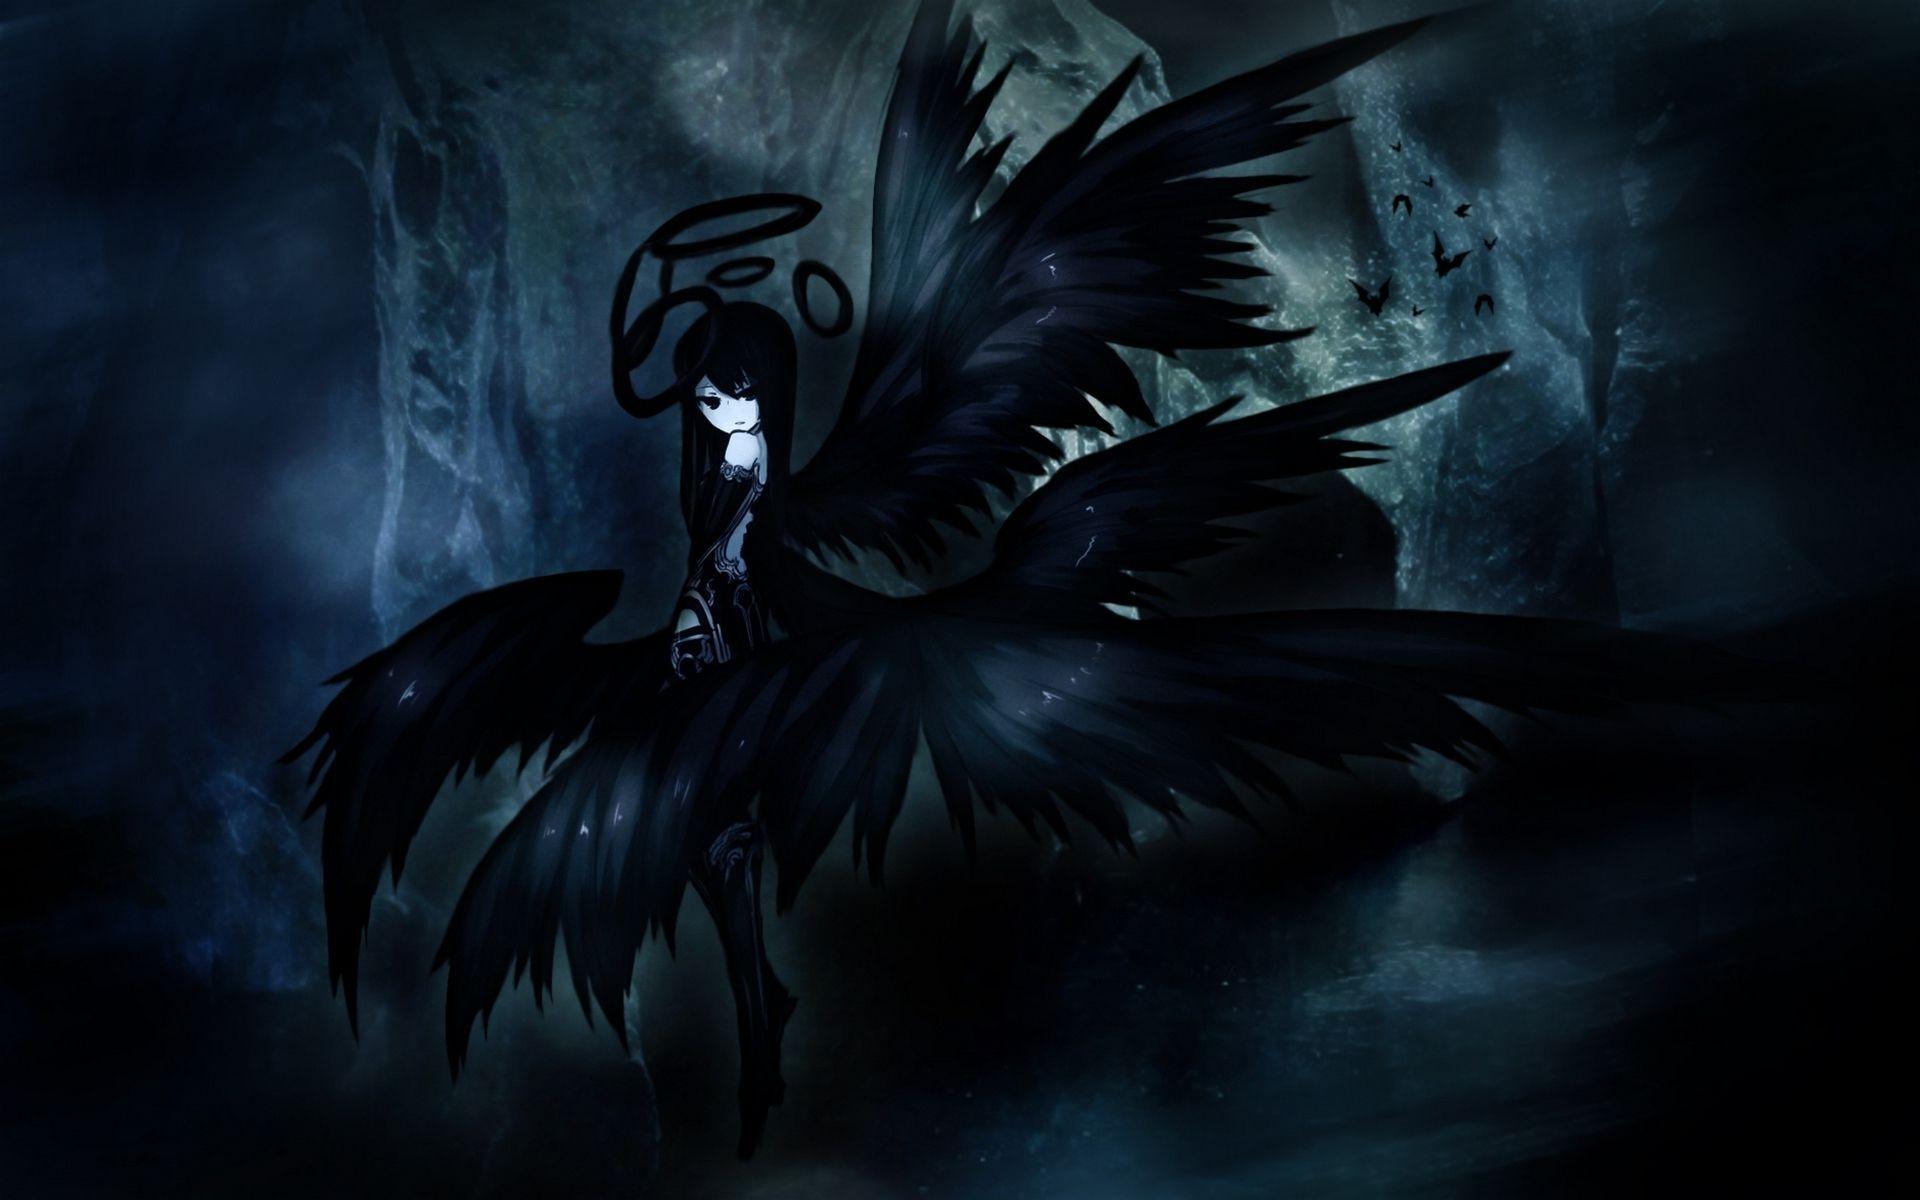 Dark Angels 40k Wallpaper 61 Images